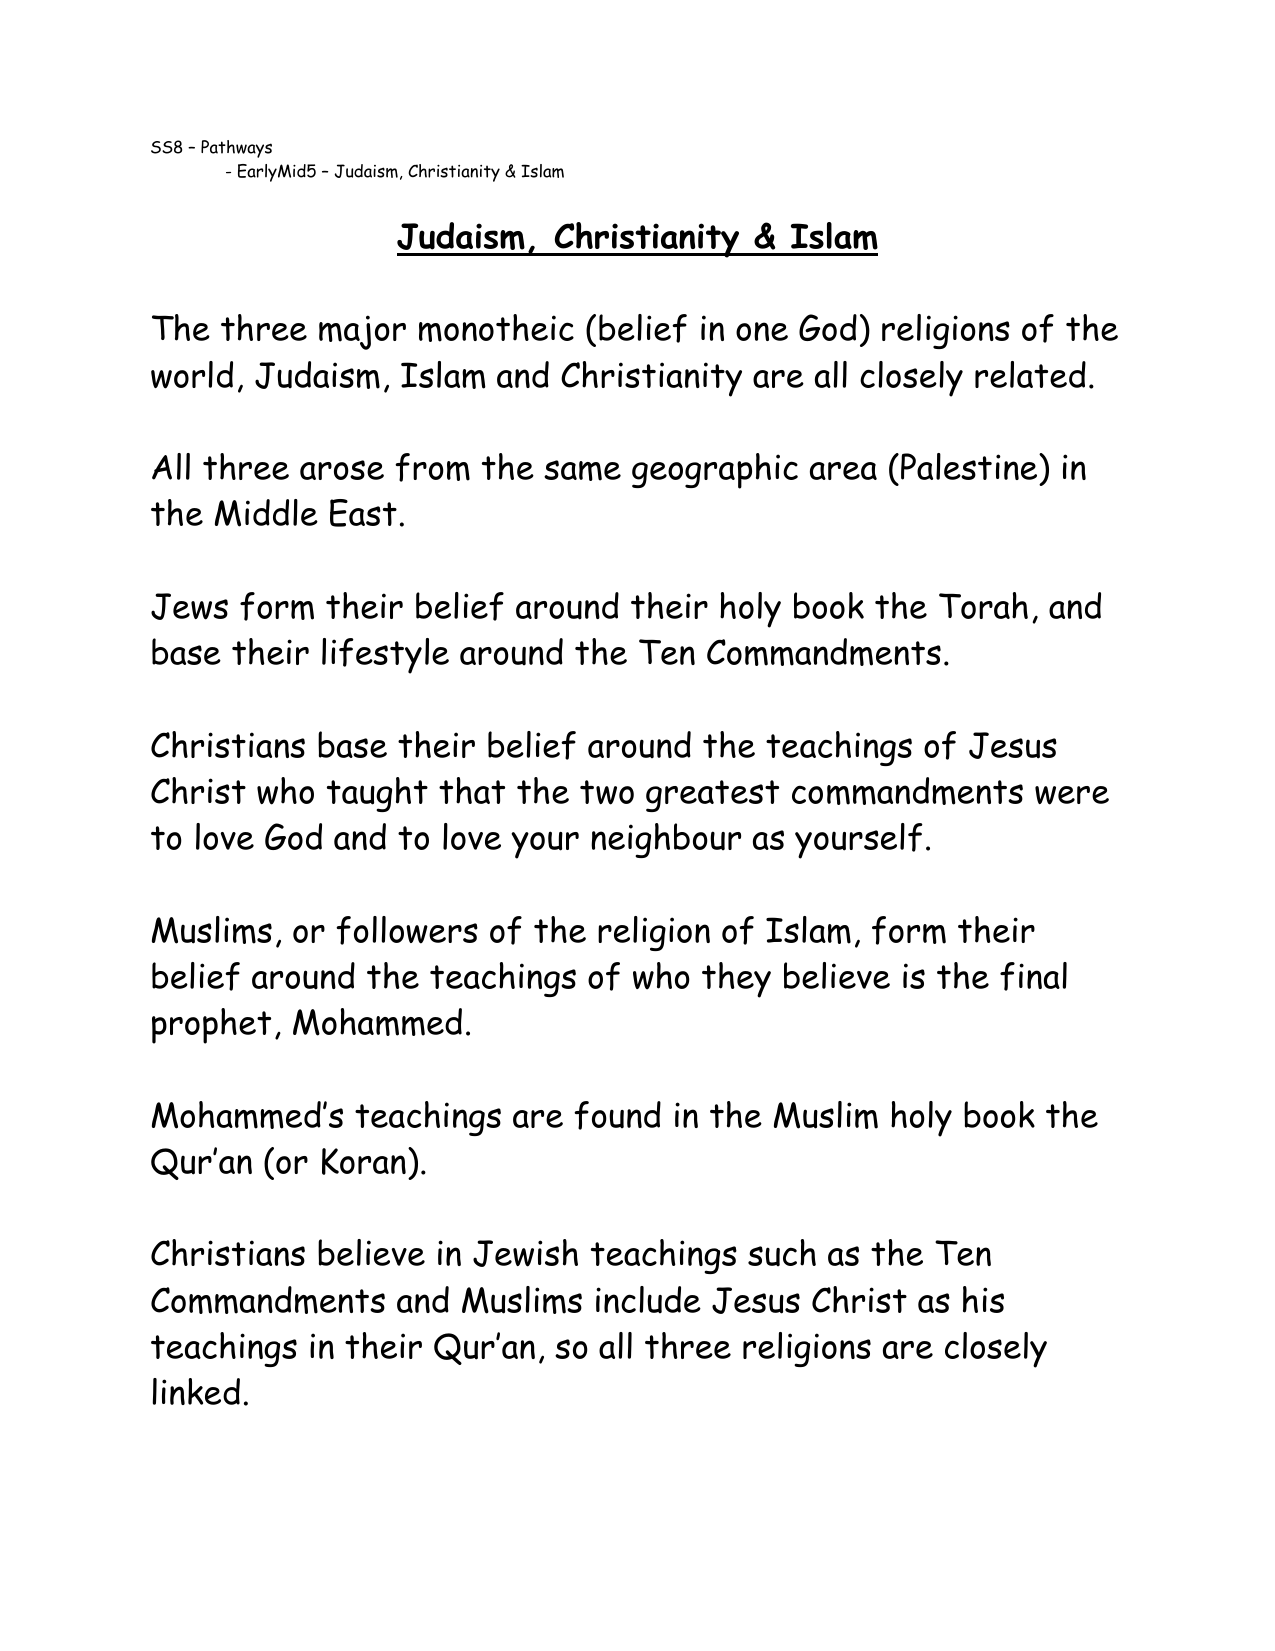 do jews believe in the ten commandments